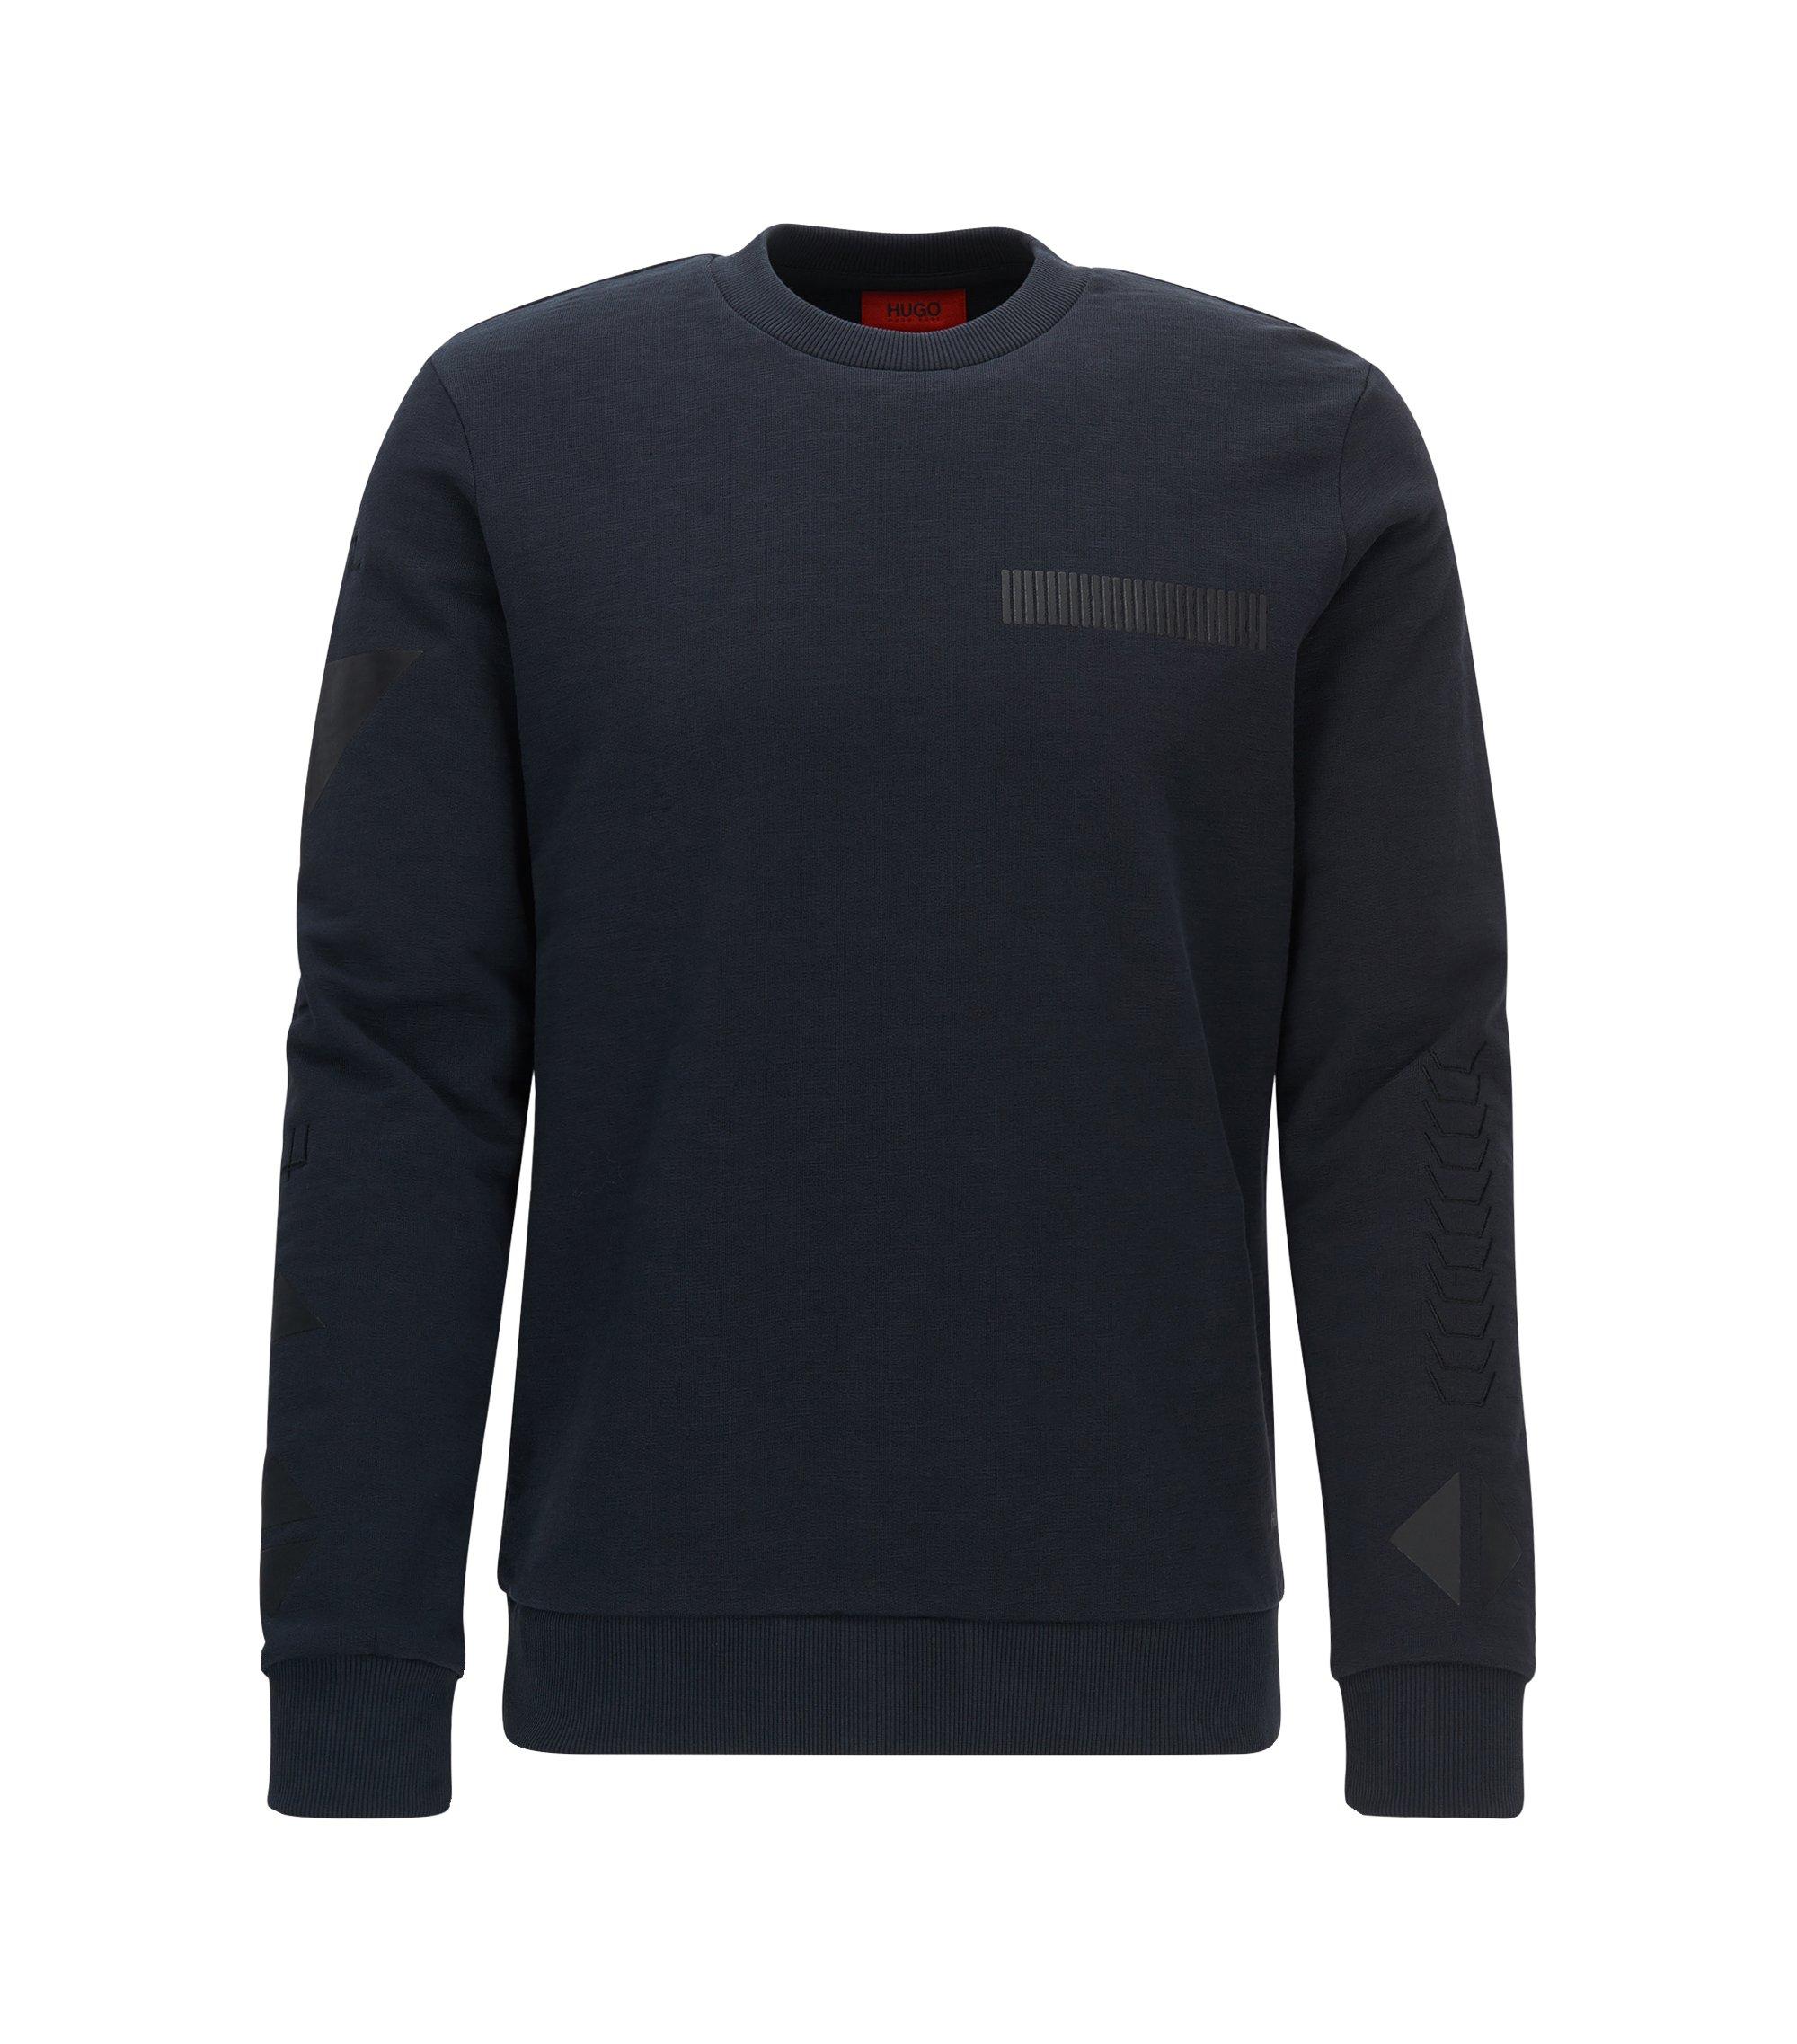 Printed Fleece Cotton Sweatershirt | Dopkins, Dark Blue